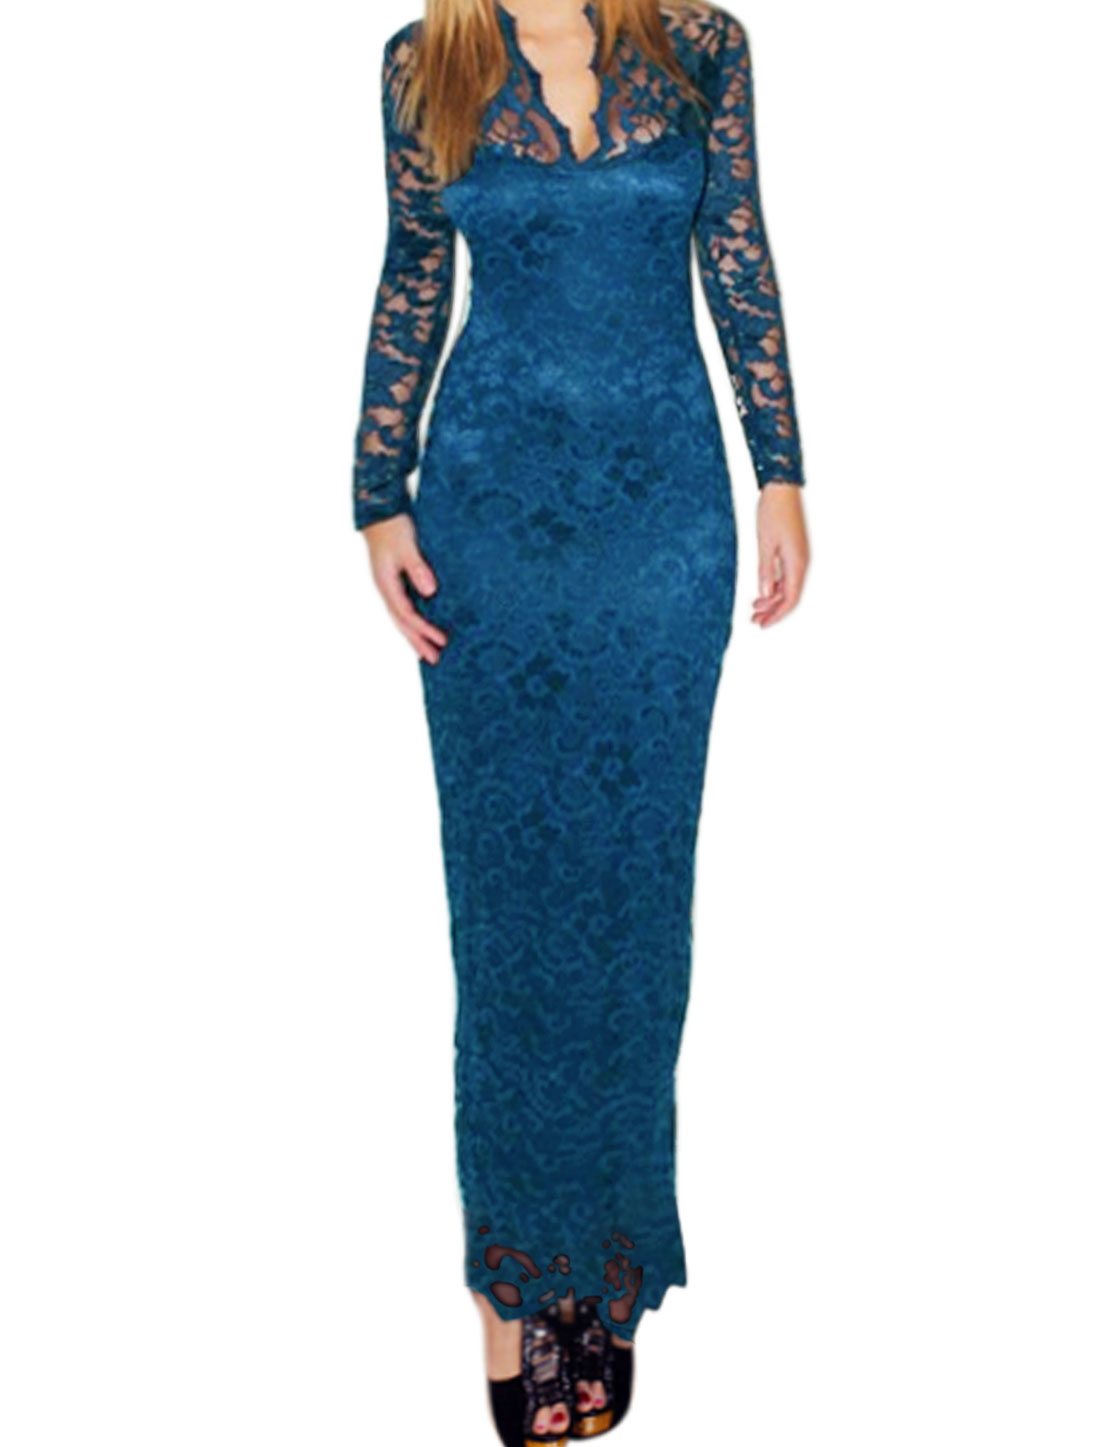 Women Semi Sheer Upper Scalloped V Neck Floral Lace Maxi Dress Blue L